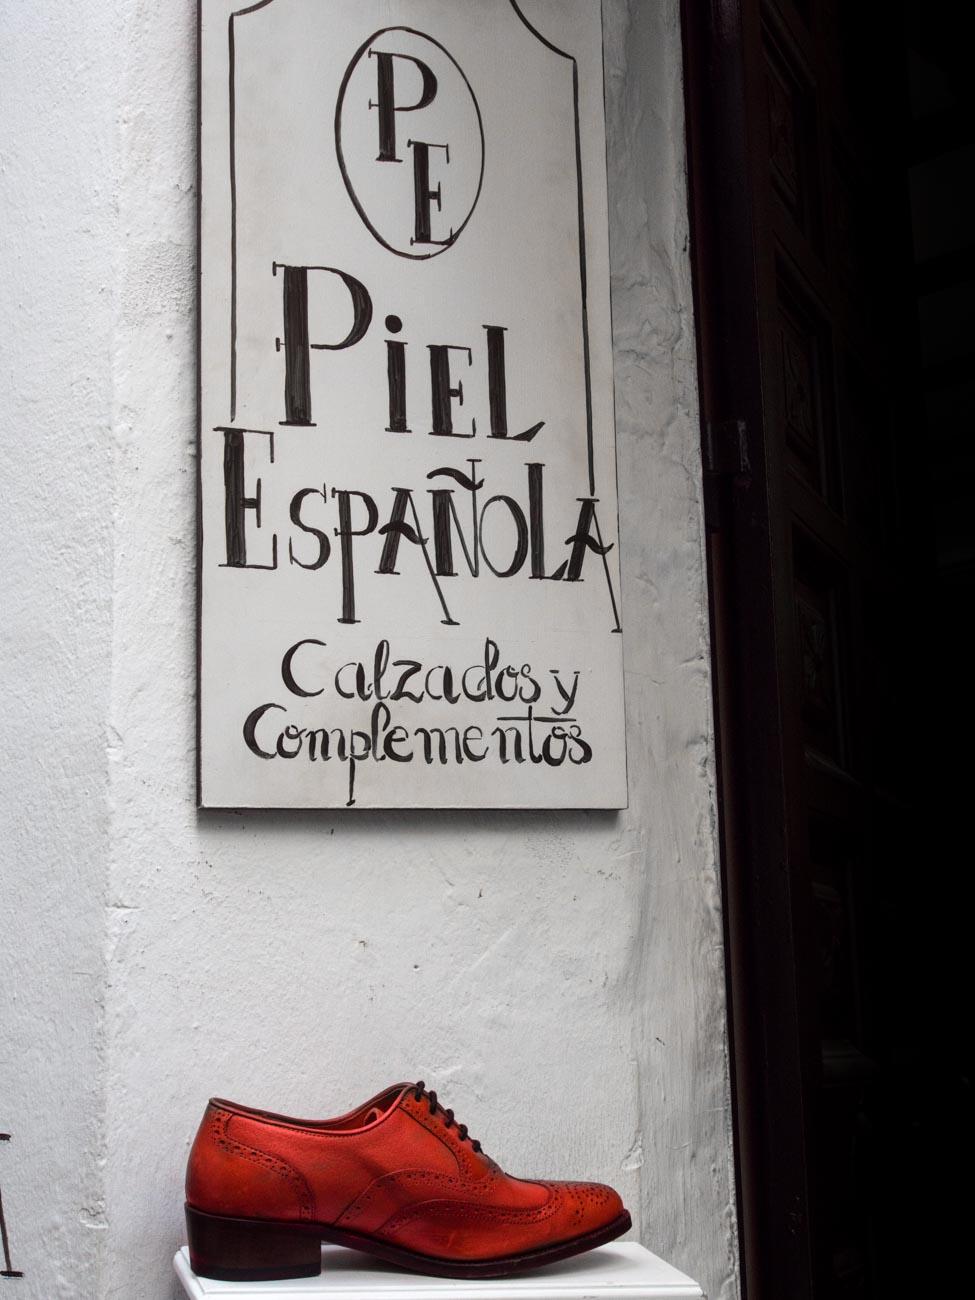 Stock photo of spanish shoe shop